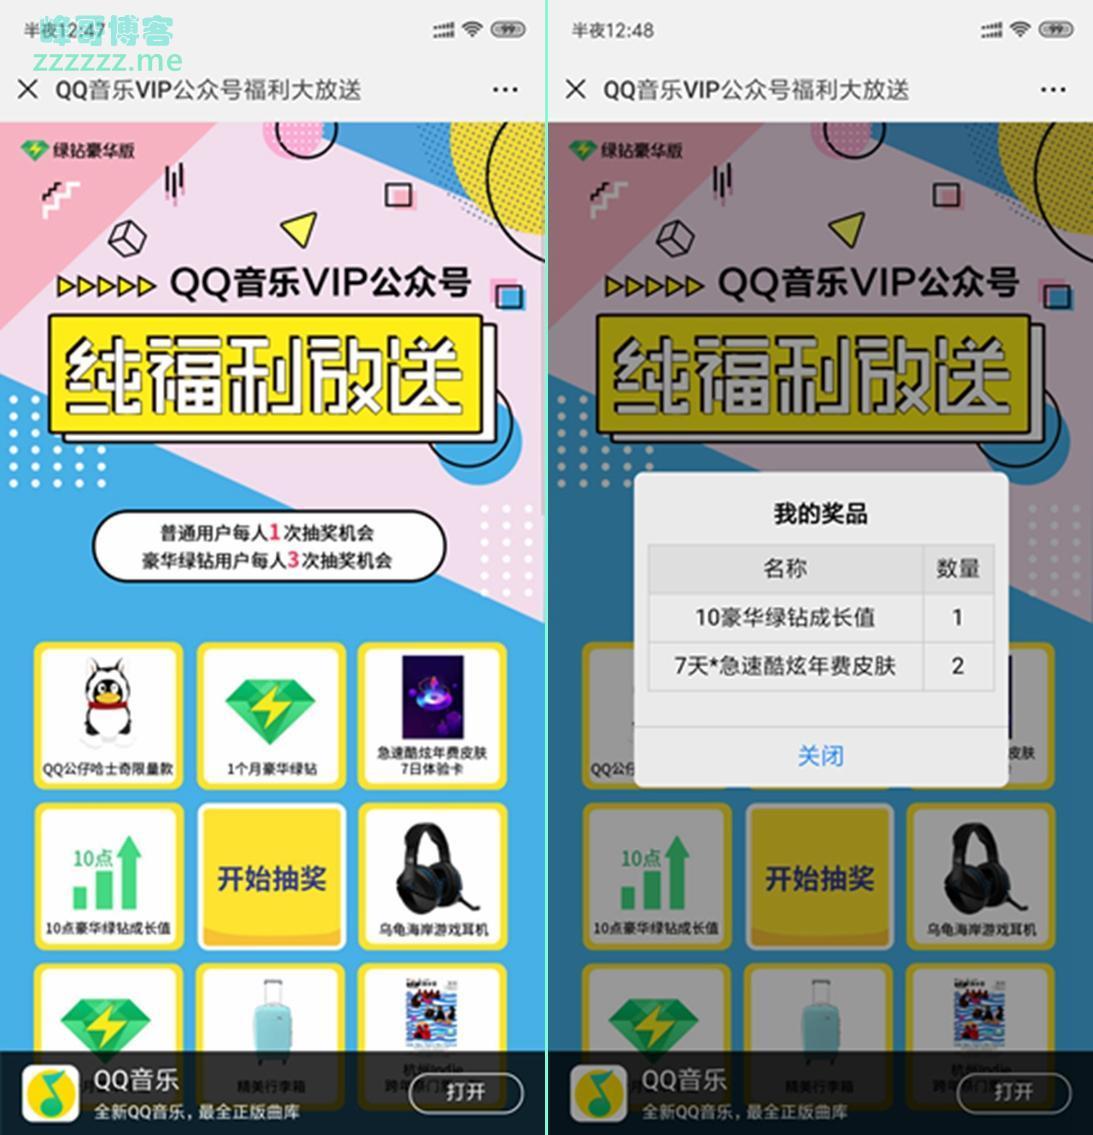 QQ音乐VIP公众号福利发放送活动 抽奖活动100%中奖!